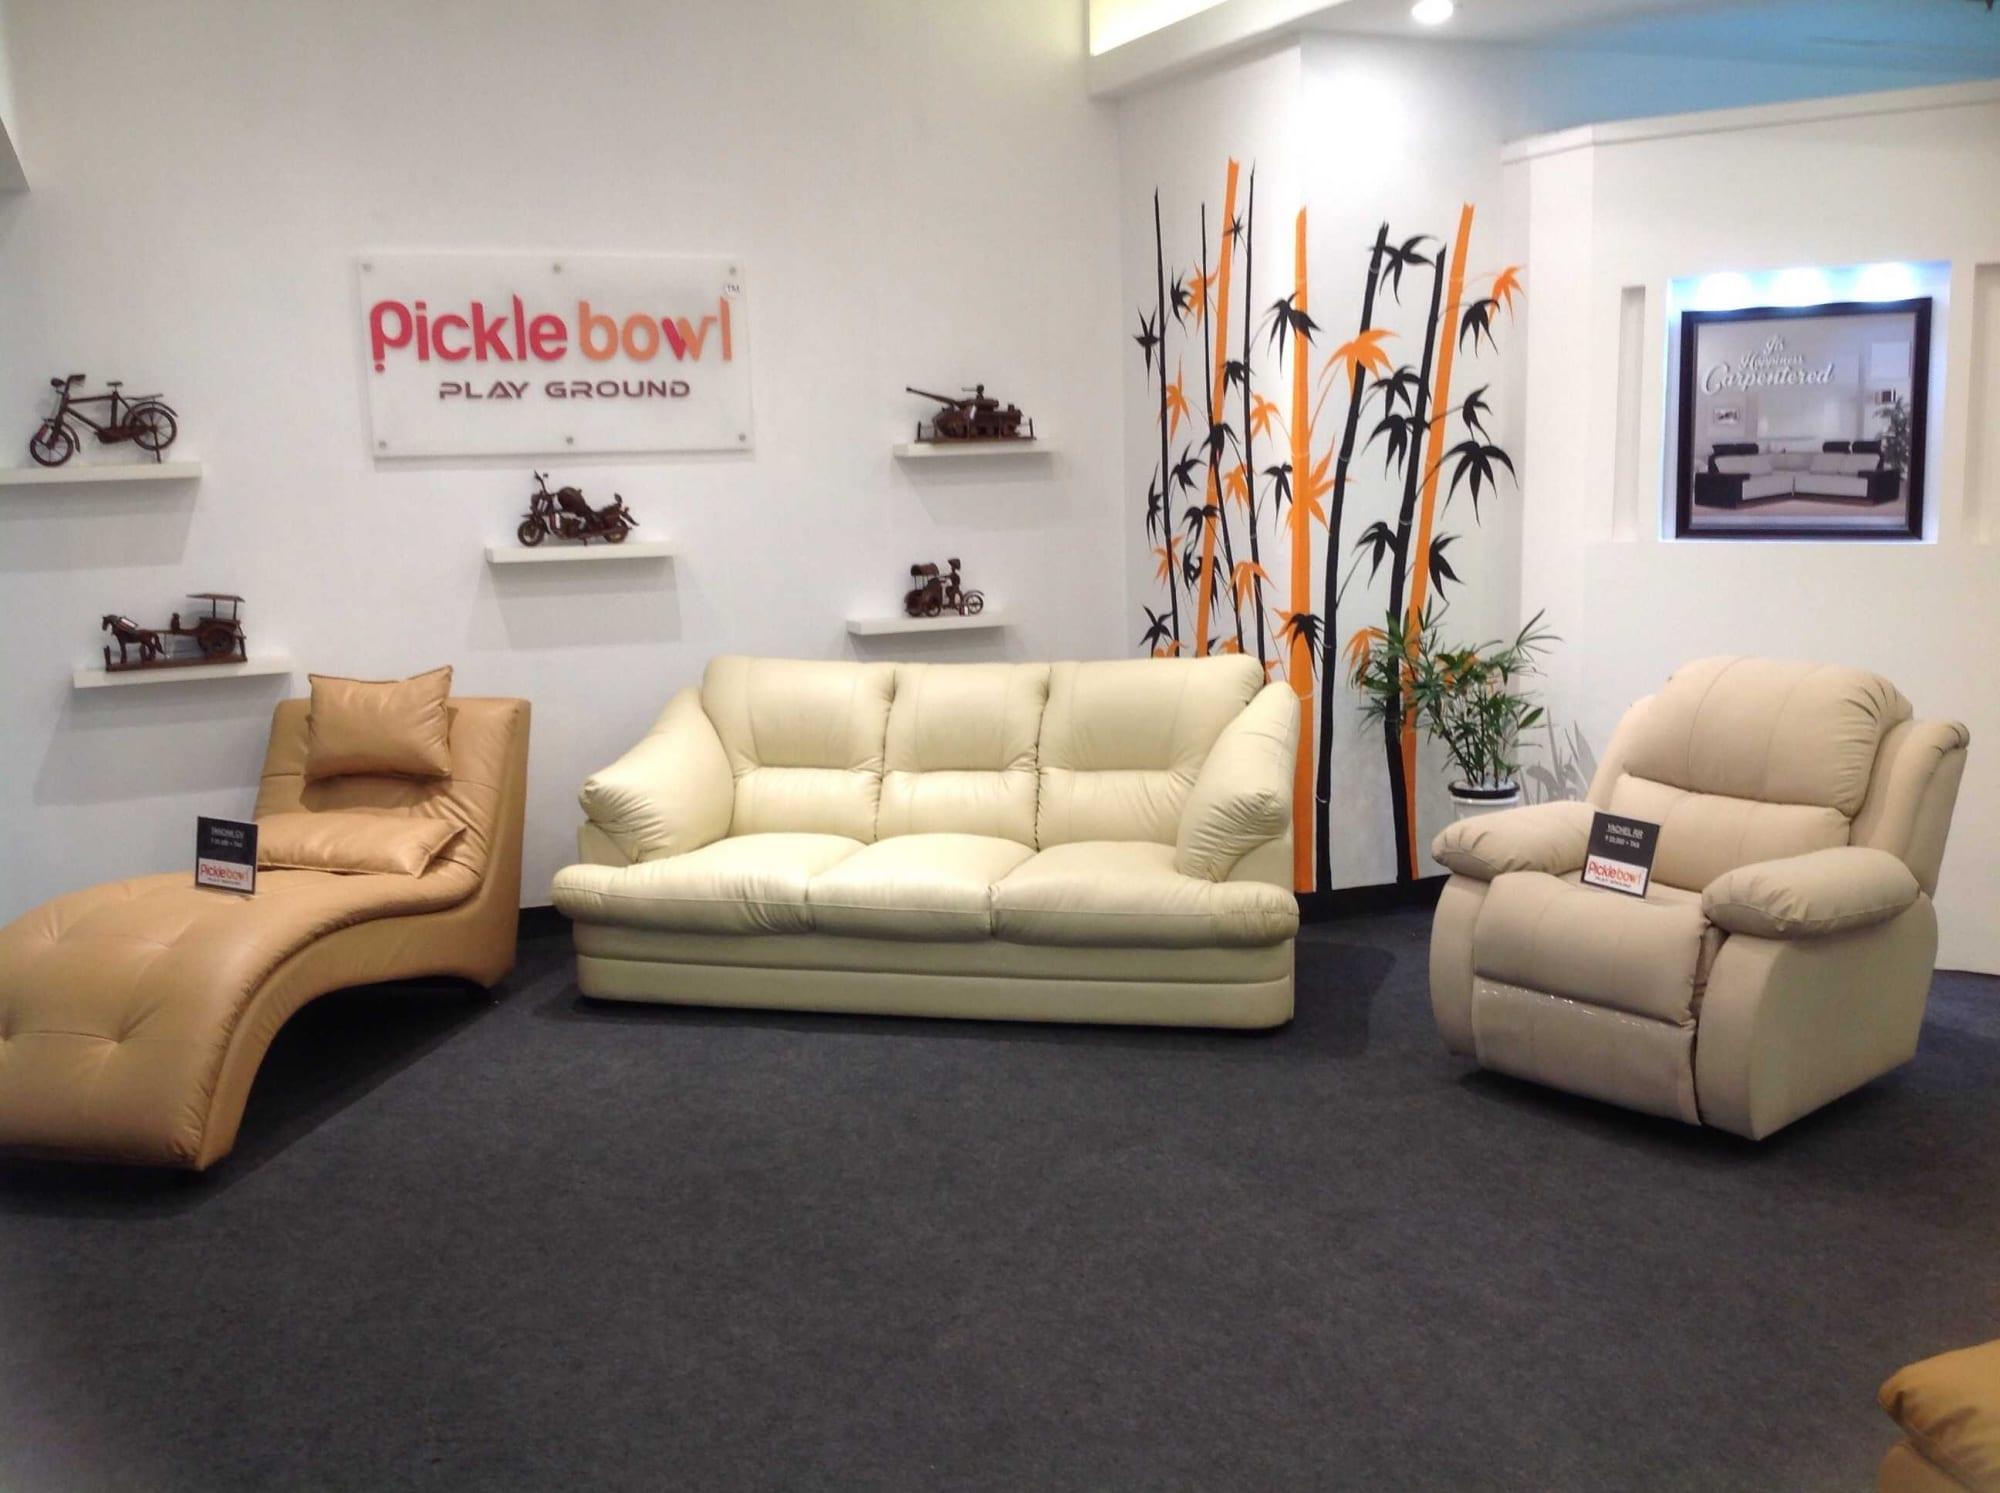 Pickle Bowl Oberon Mall Edapally